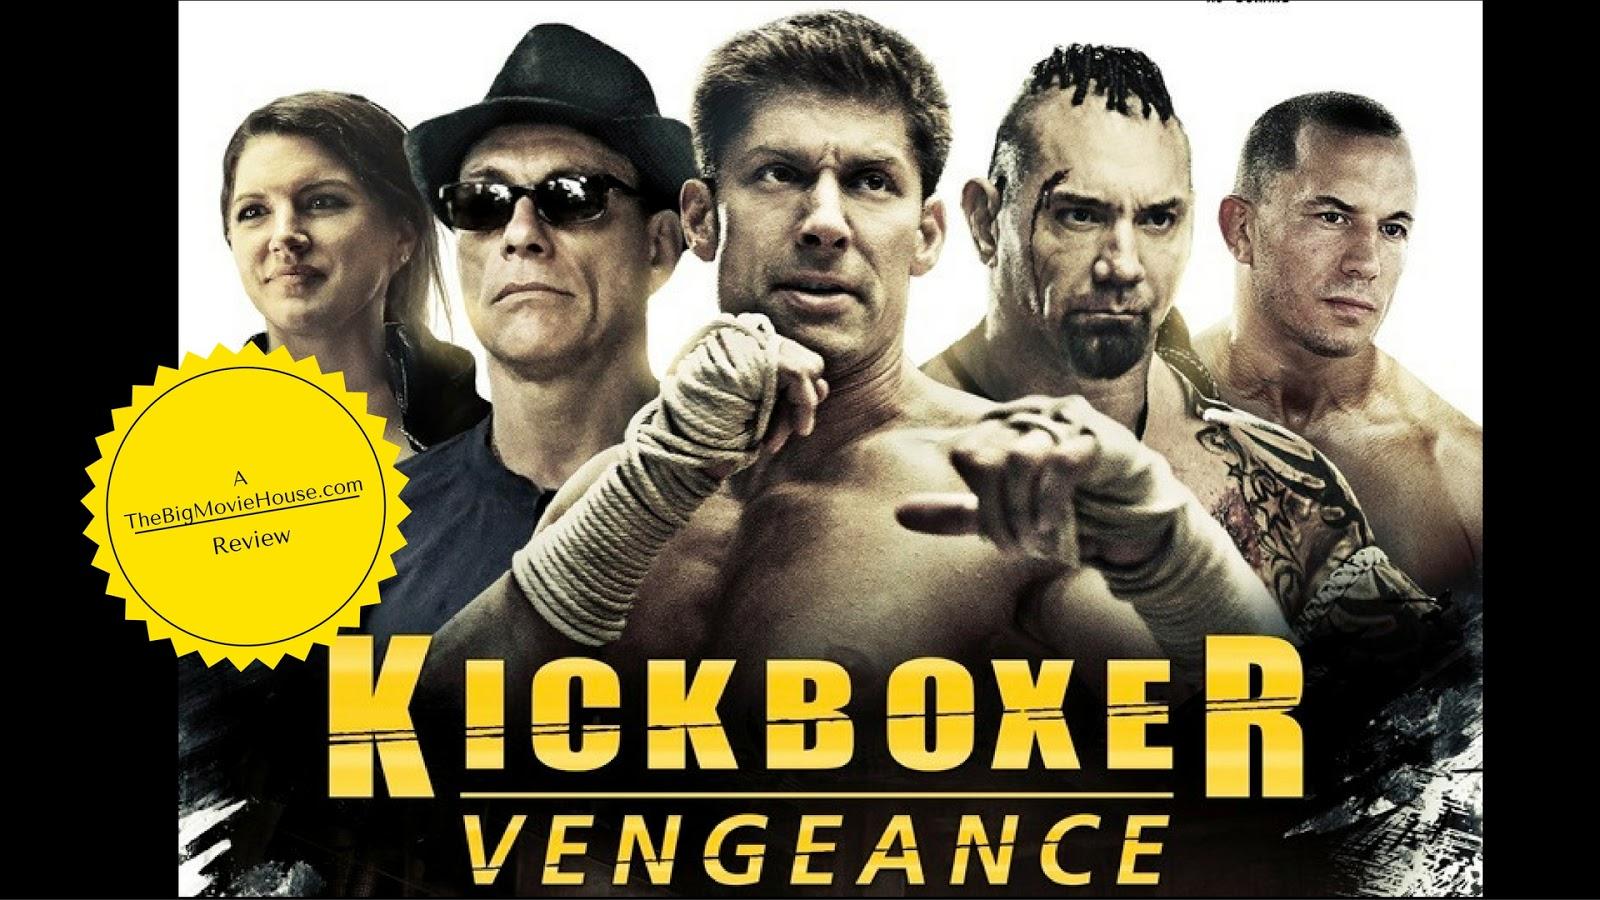 Kickboxer wallpapers, Movie, HQ Kickboxer pictures   4K ...